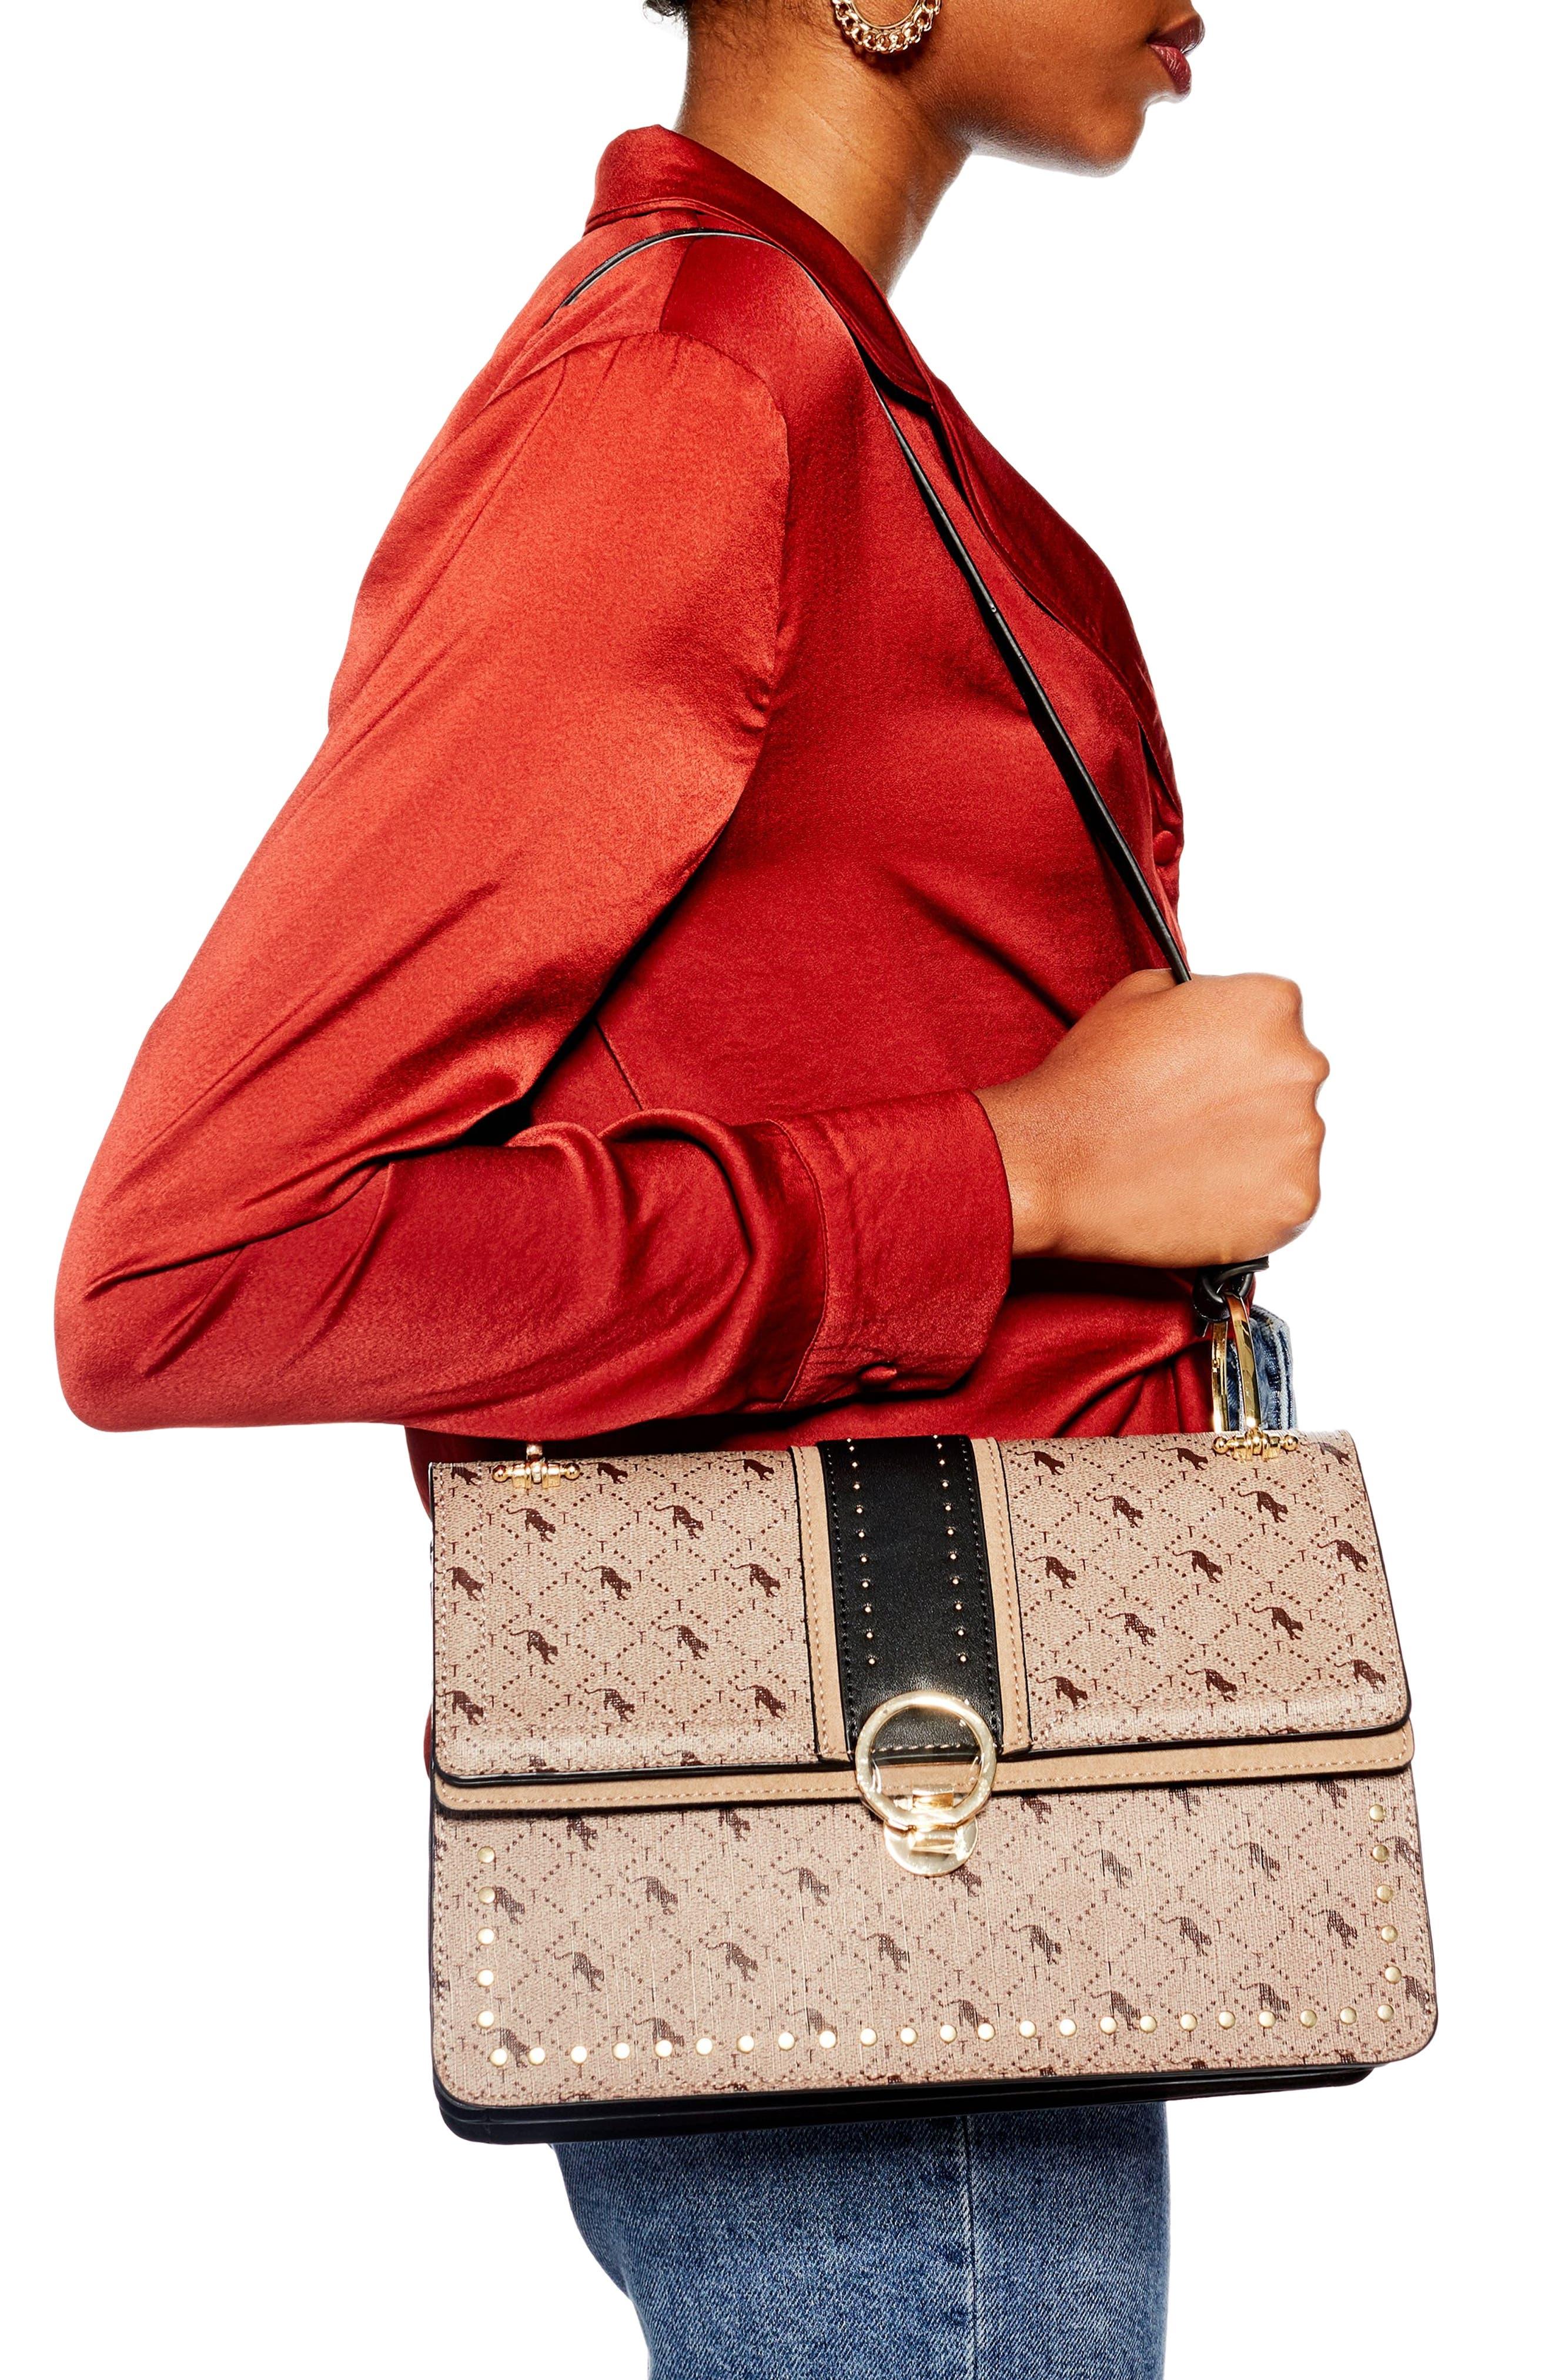 Madrid Studded Faux Leather Shoulder Bag,                             Alternate thumbnail 2, color,                             TAUPE MULTI